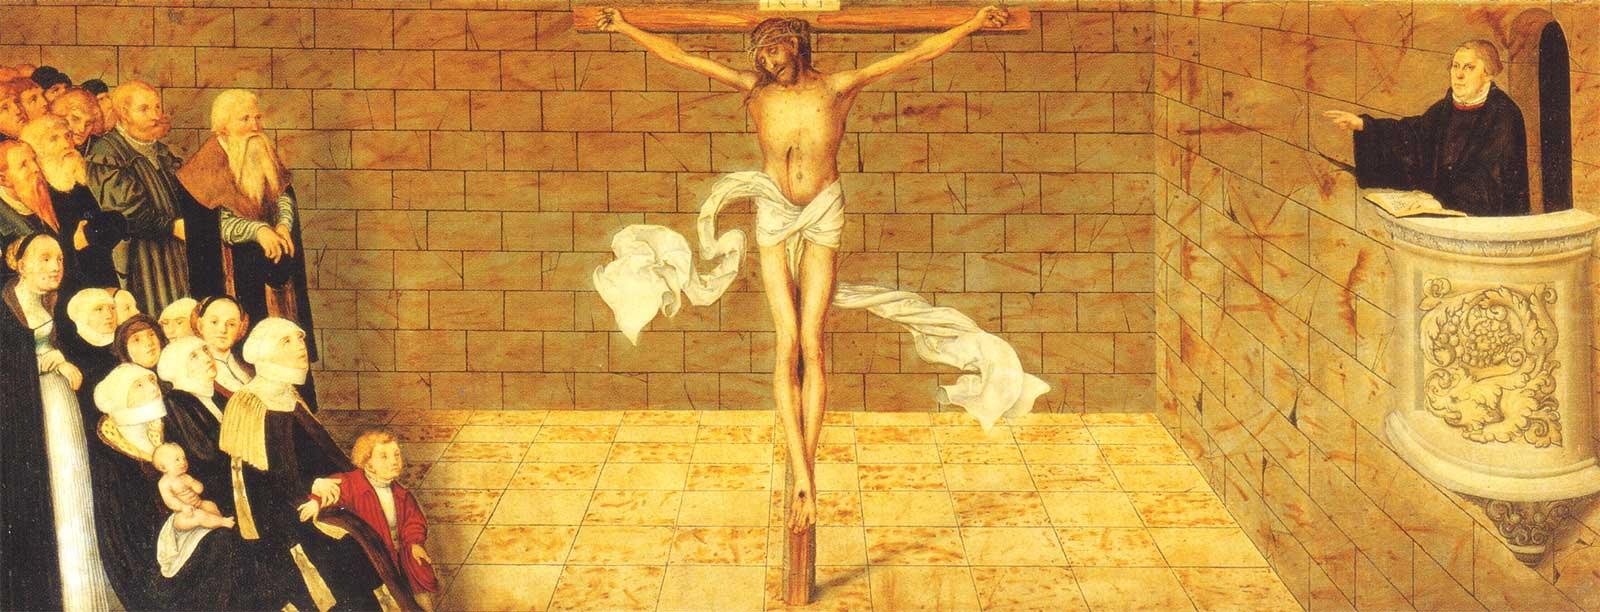 Sermon January 5, 2014/ Vicar James Preus/ Jesus Fulfills The Law For Our Sake / Luke 2:40-52 - Image 5